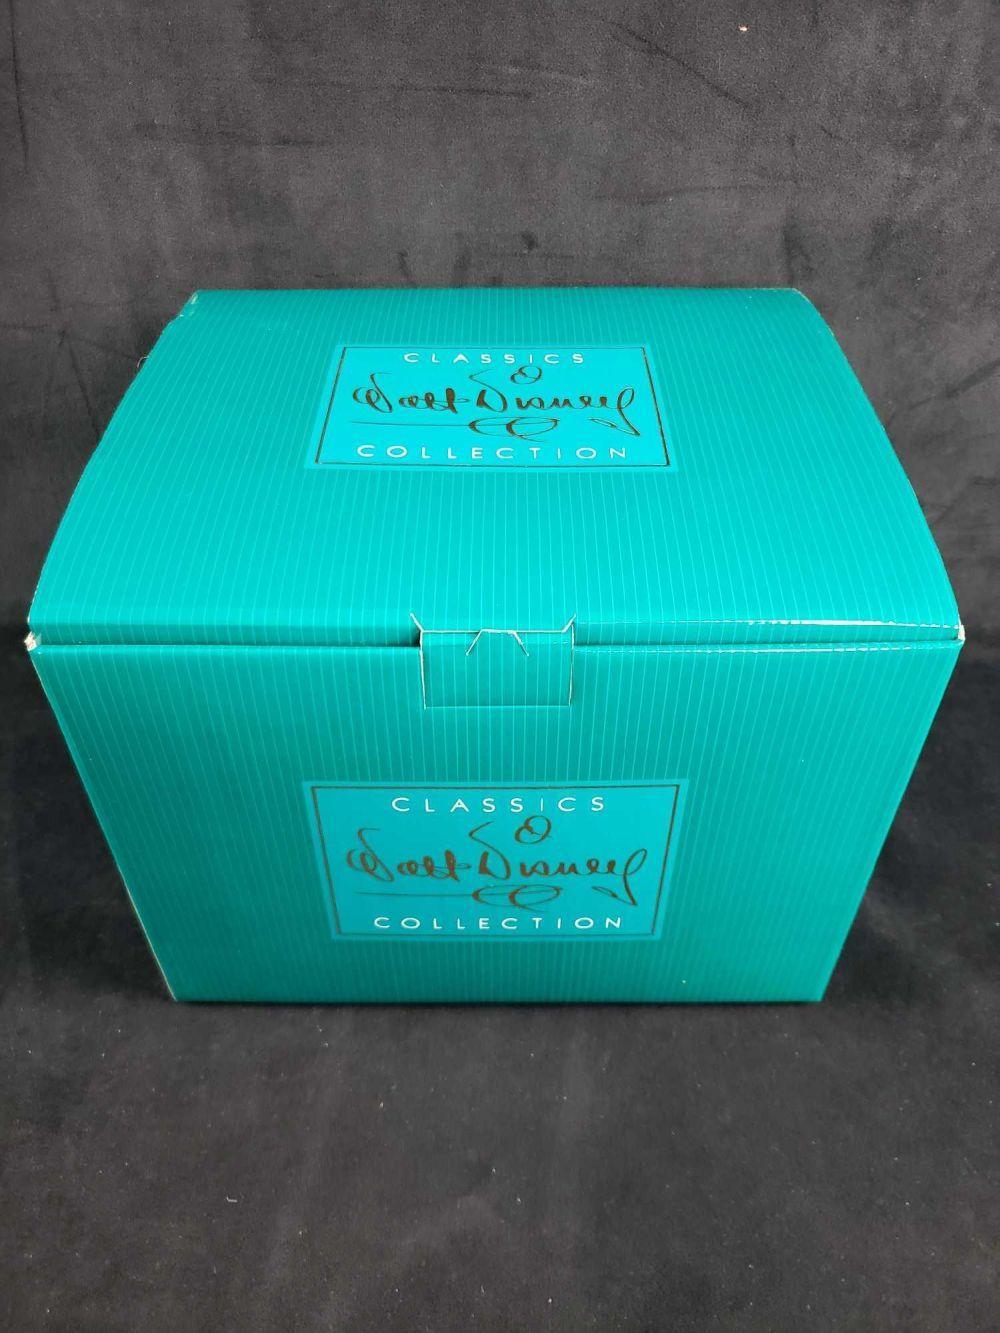 Lot 701: Disney Classics Collection Ursula Figurine in Box with COA